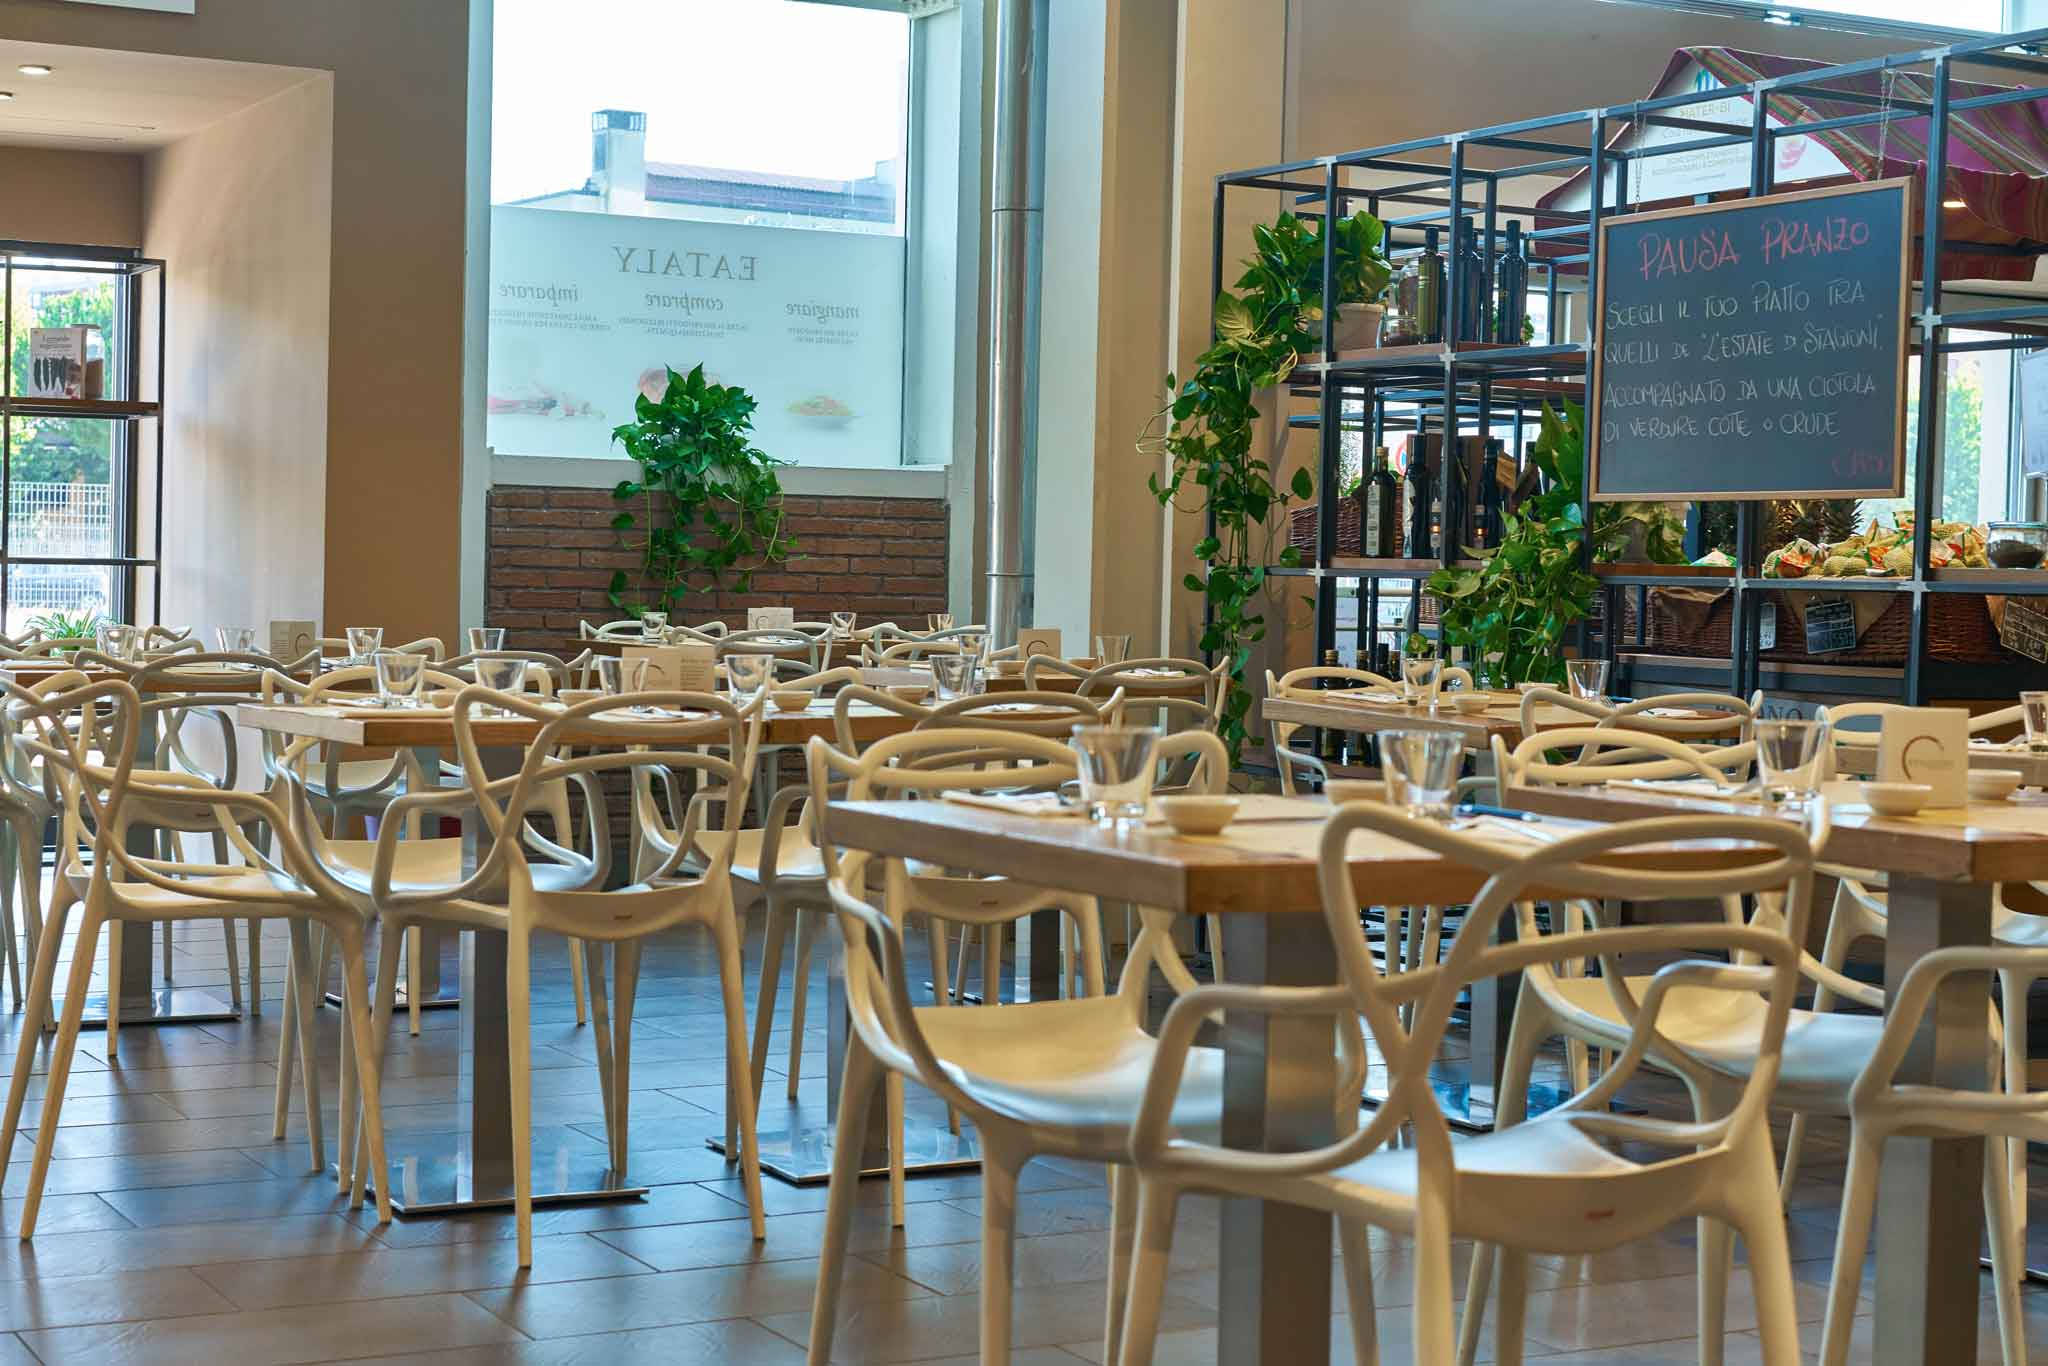 Eataly Roma ristorante Stagioni